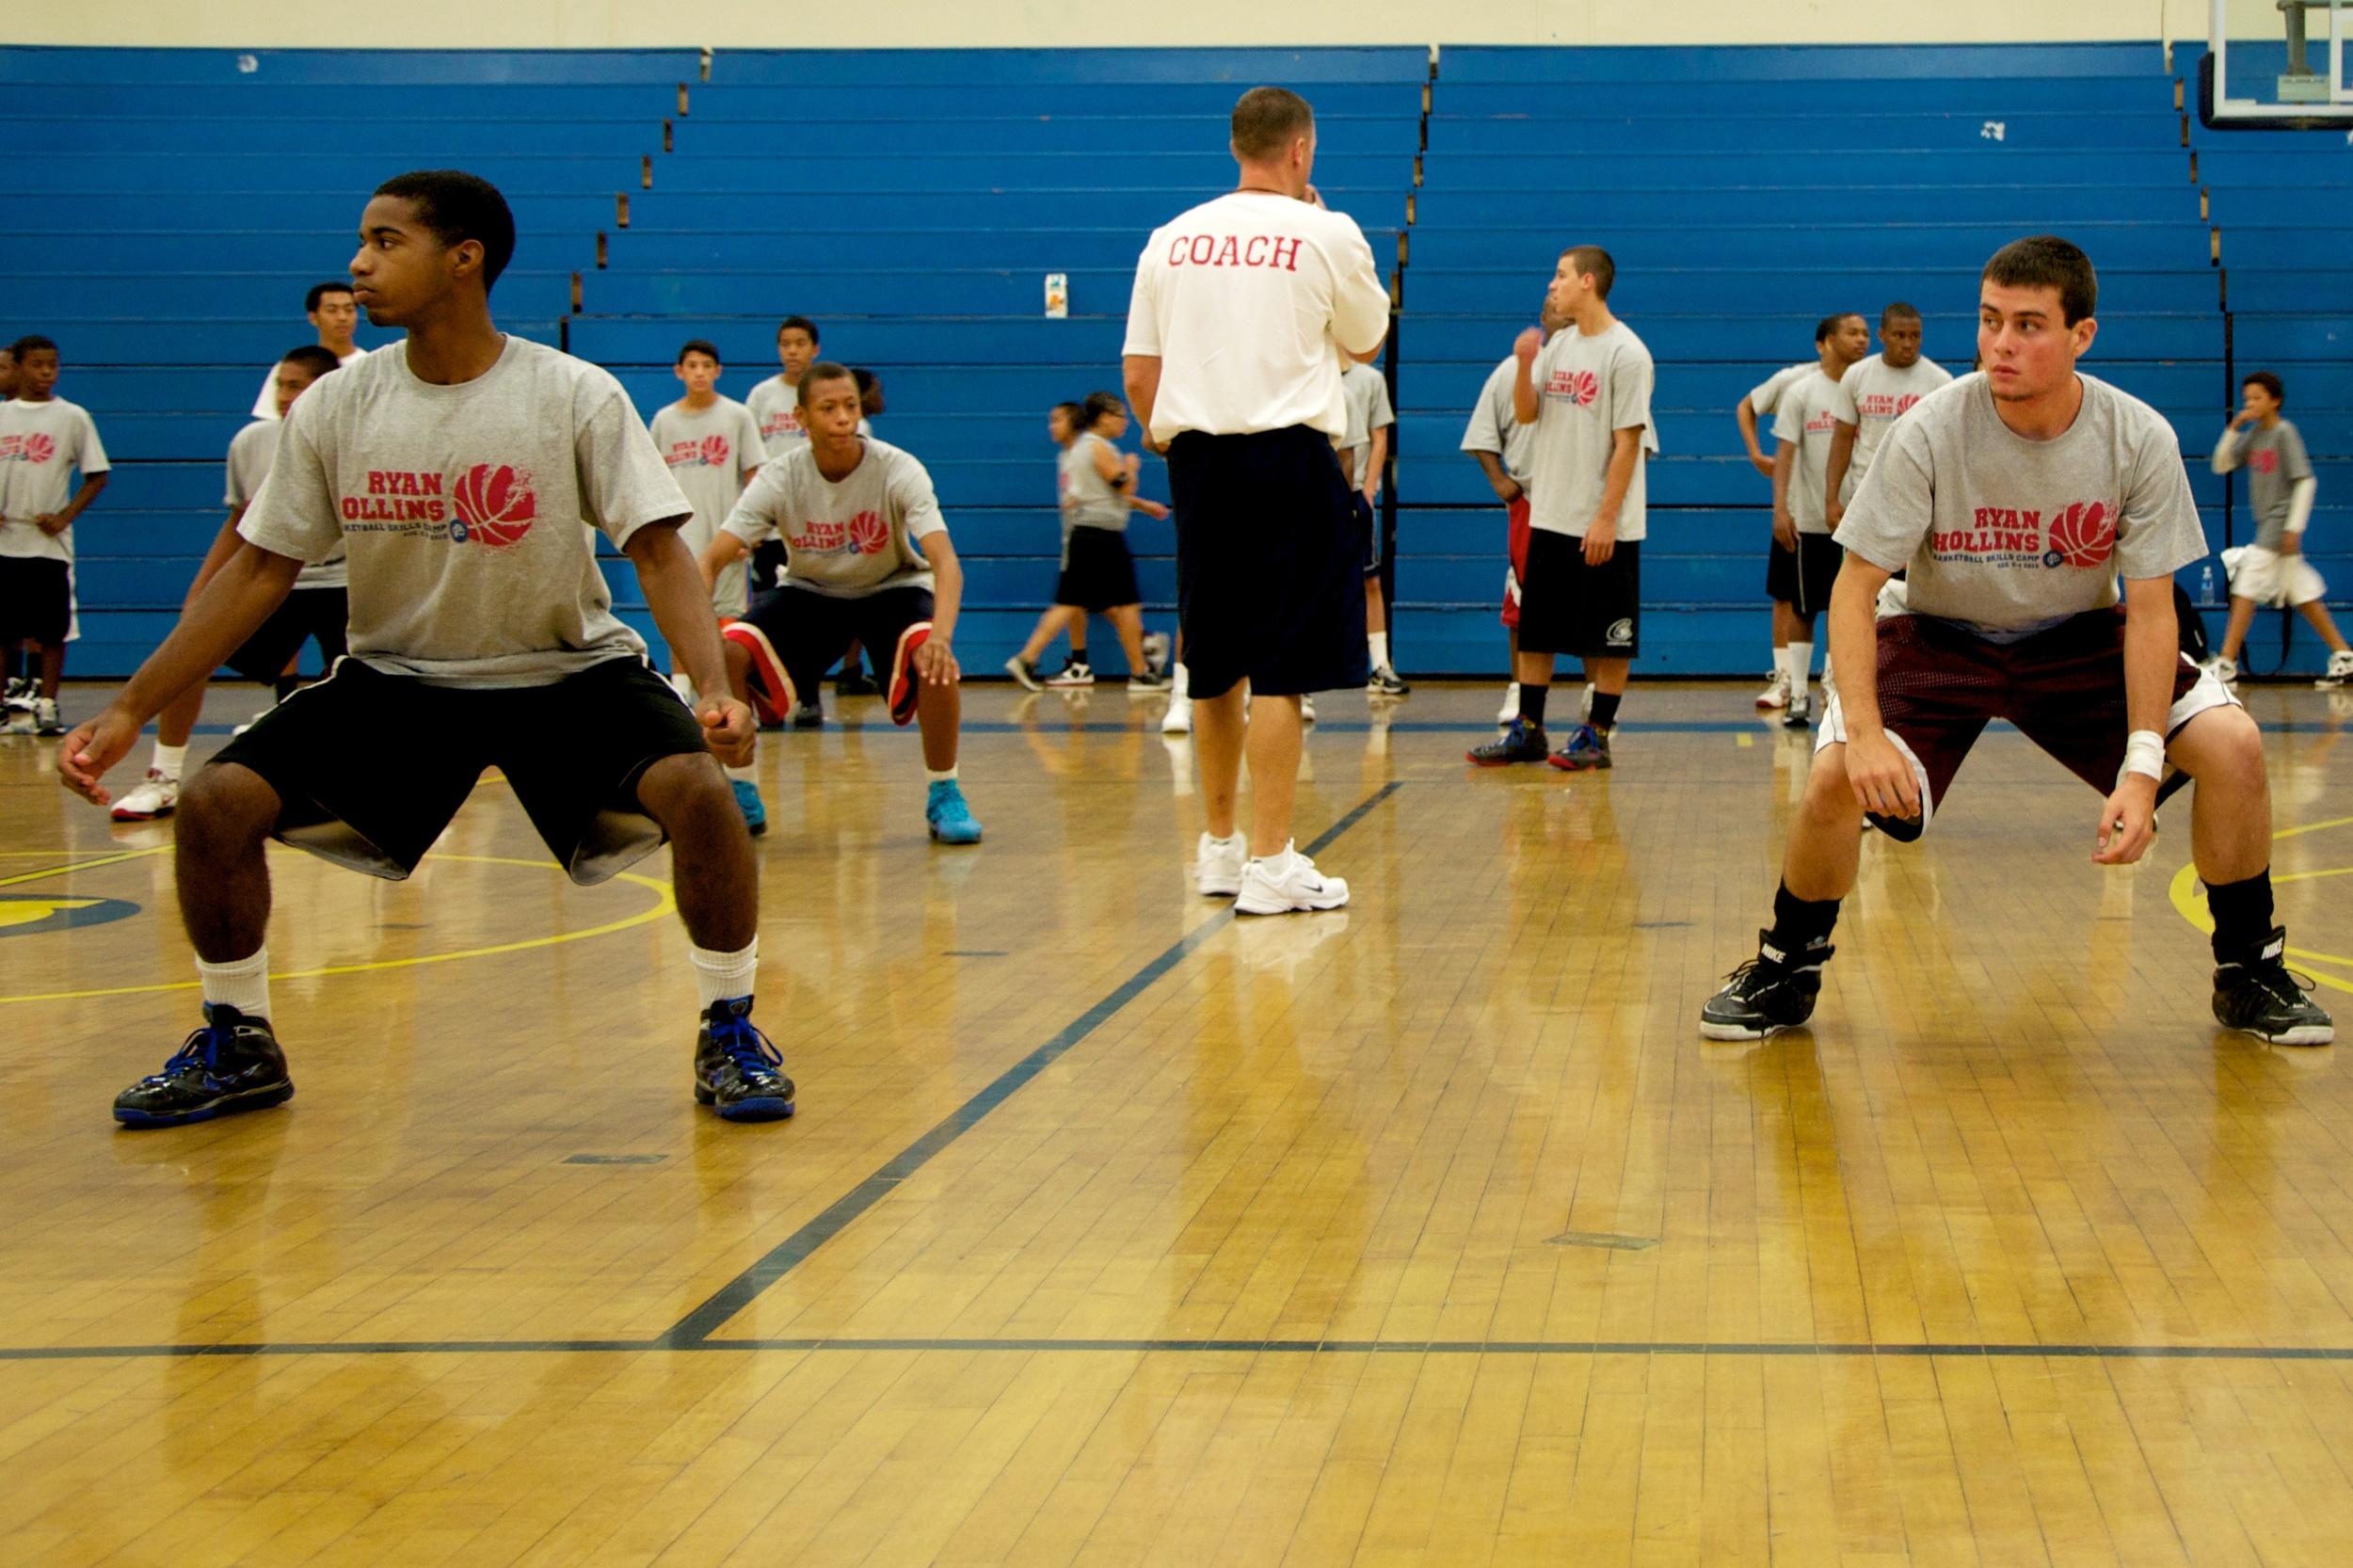 Ryan Hollins Basketball Camp 21.jpg